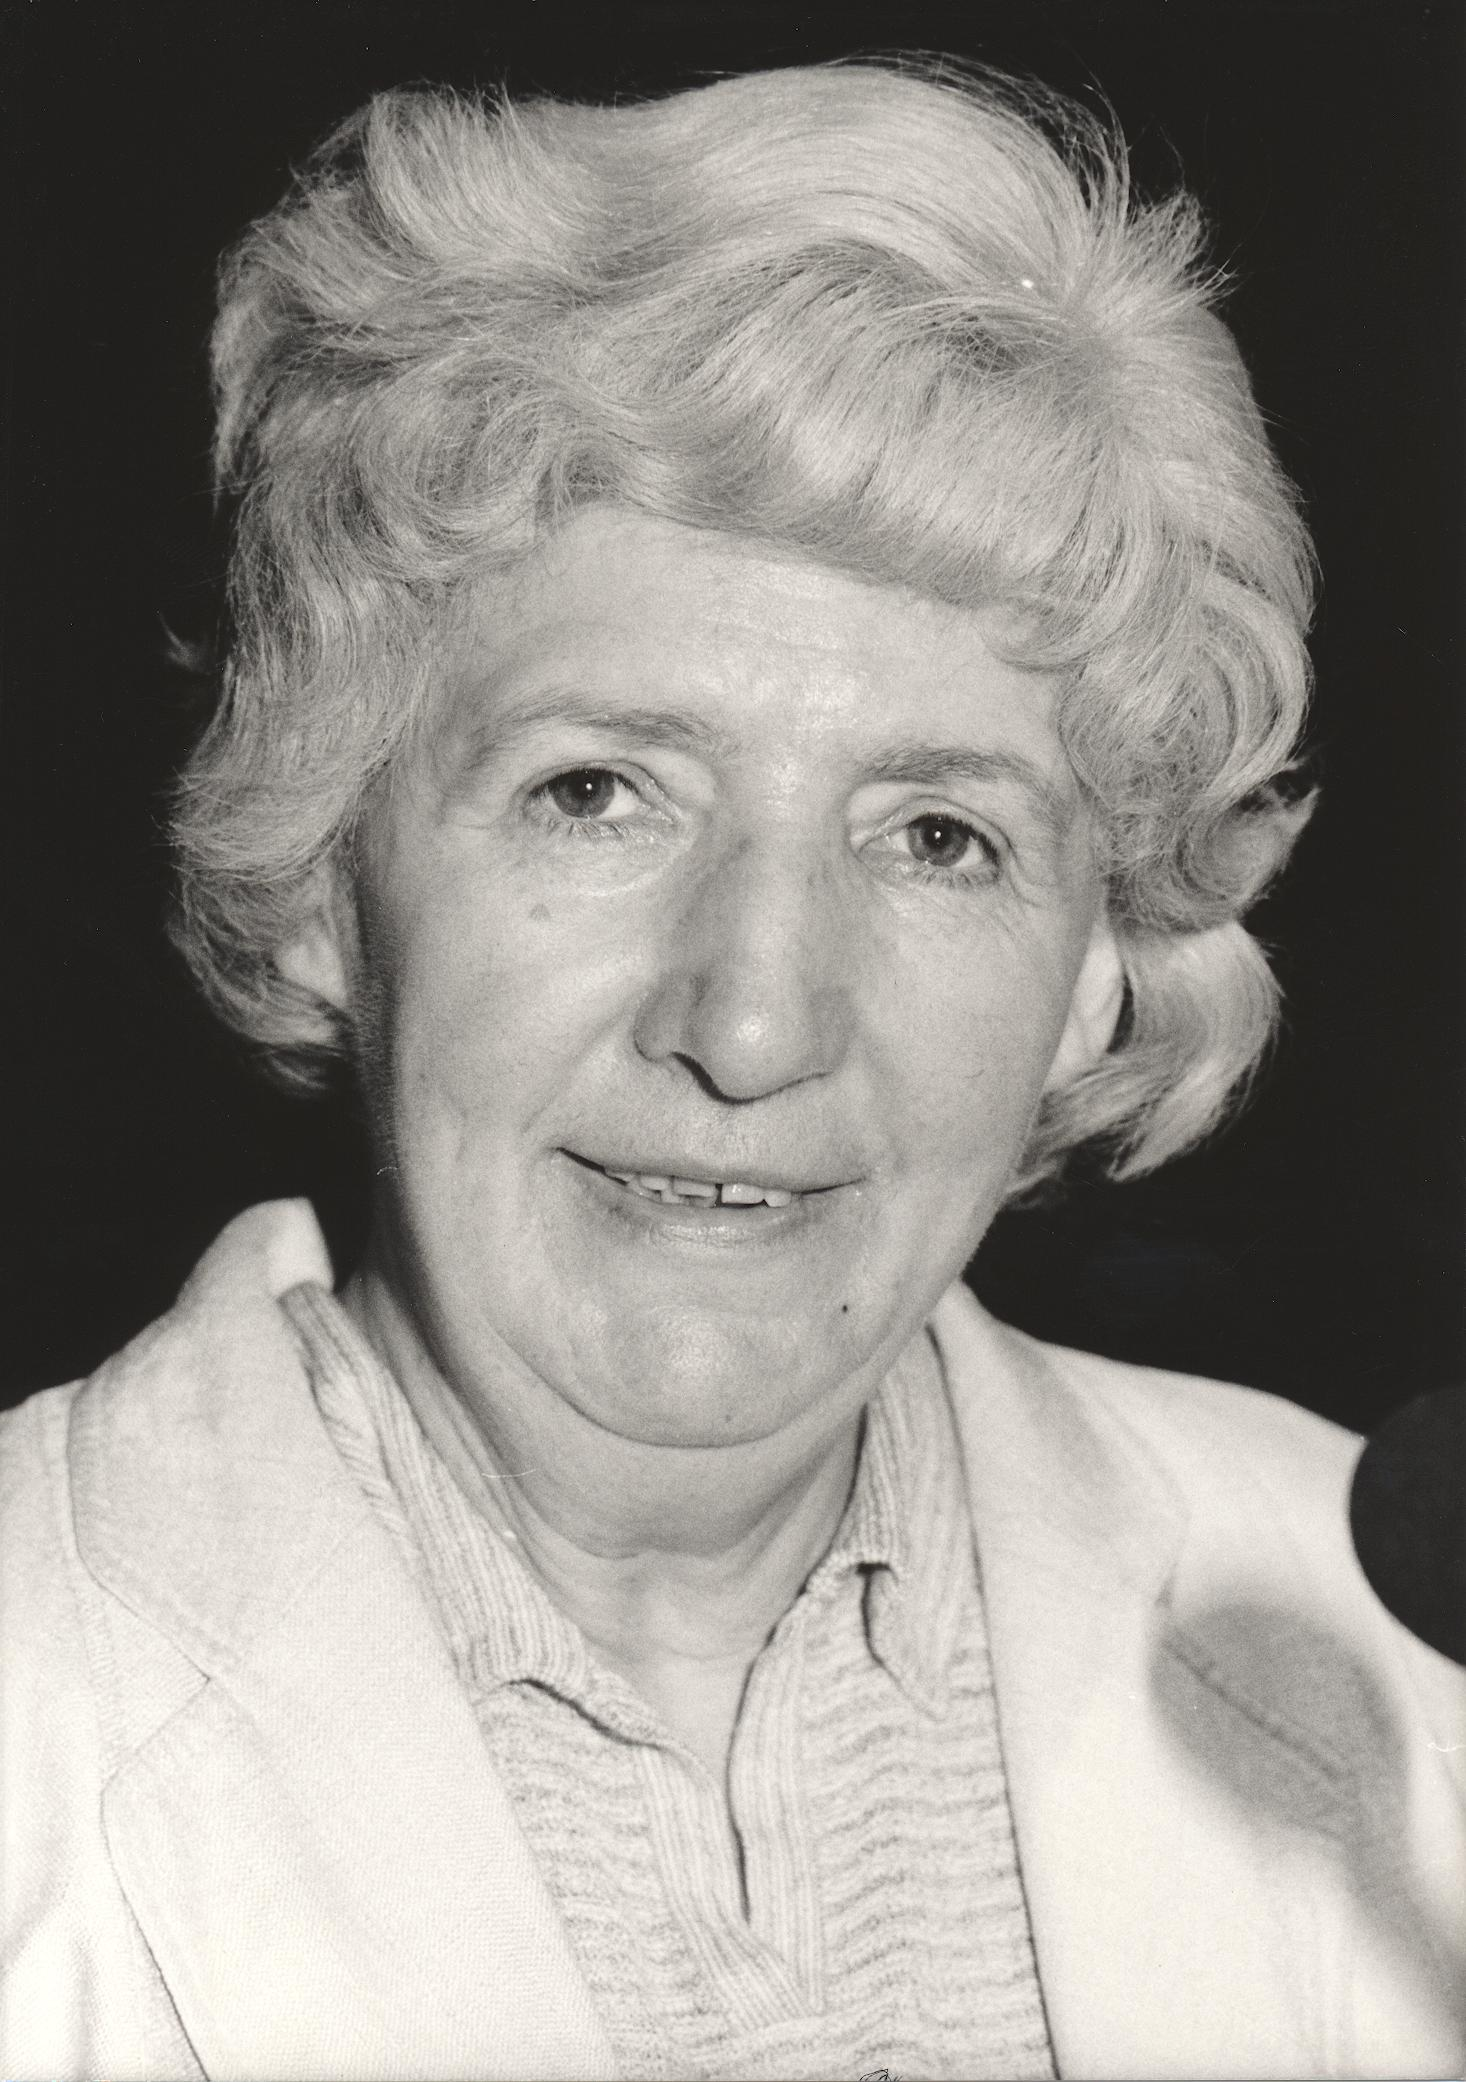 XI. Imago Mundi-Kongress 1987, Innsbruck, Rosemarie Mieg